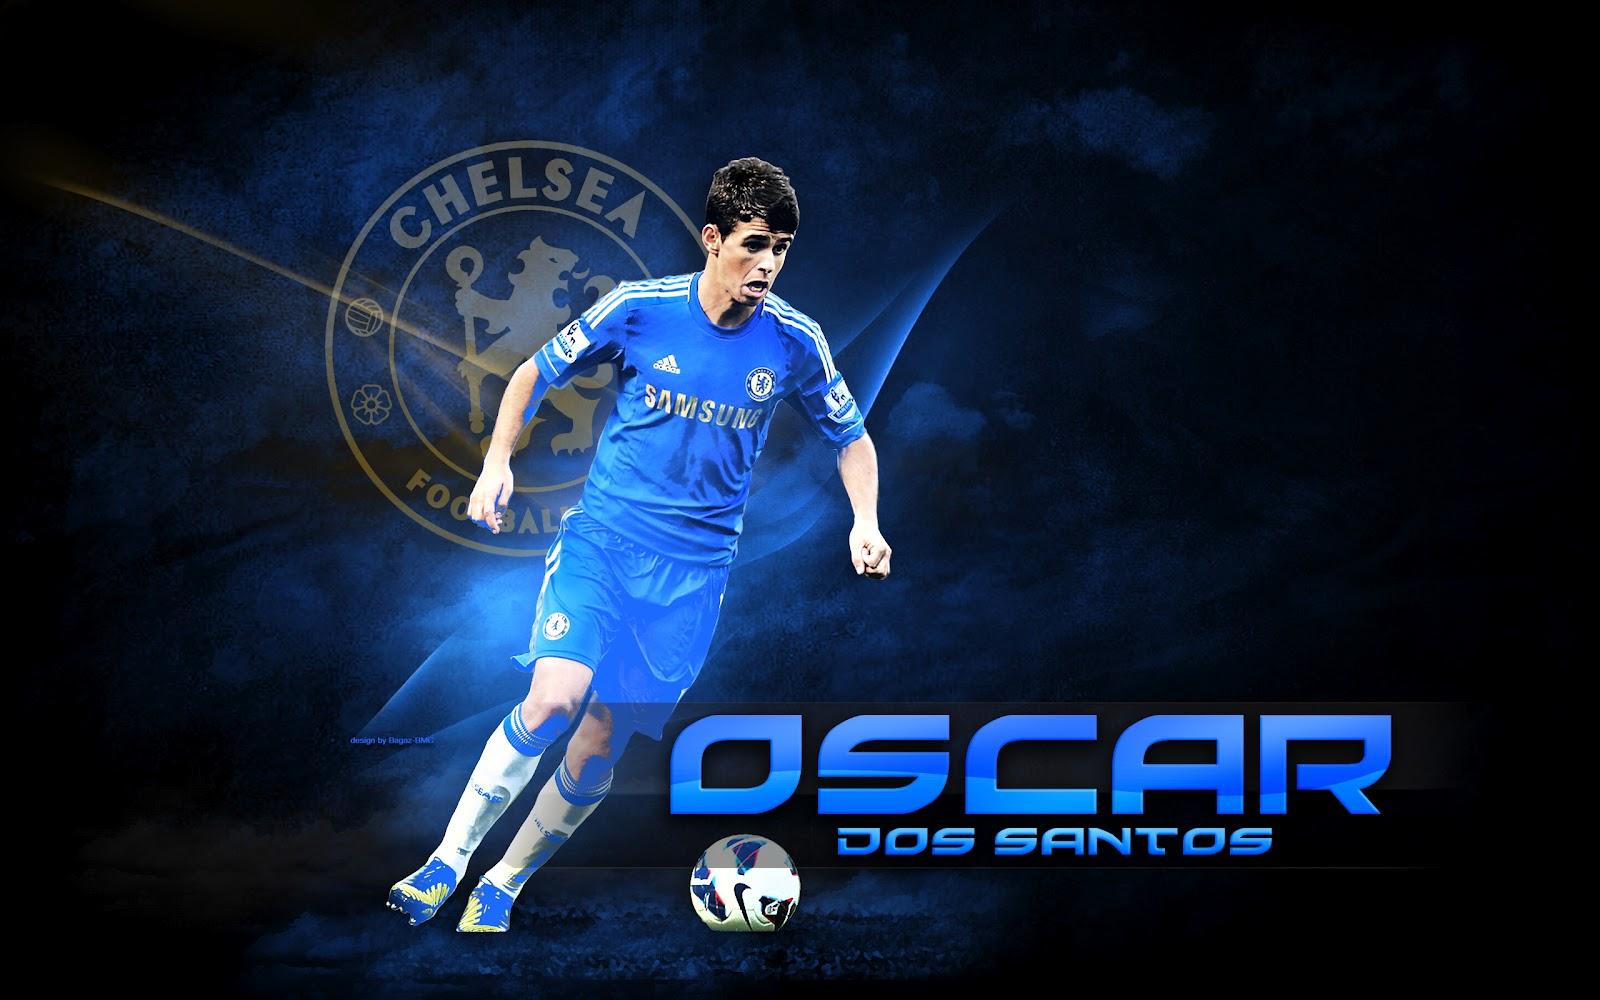 Oscar Image Chelsea